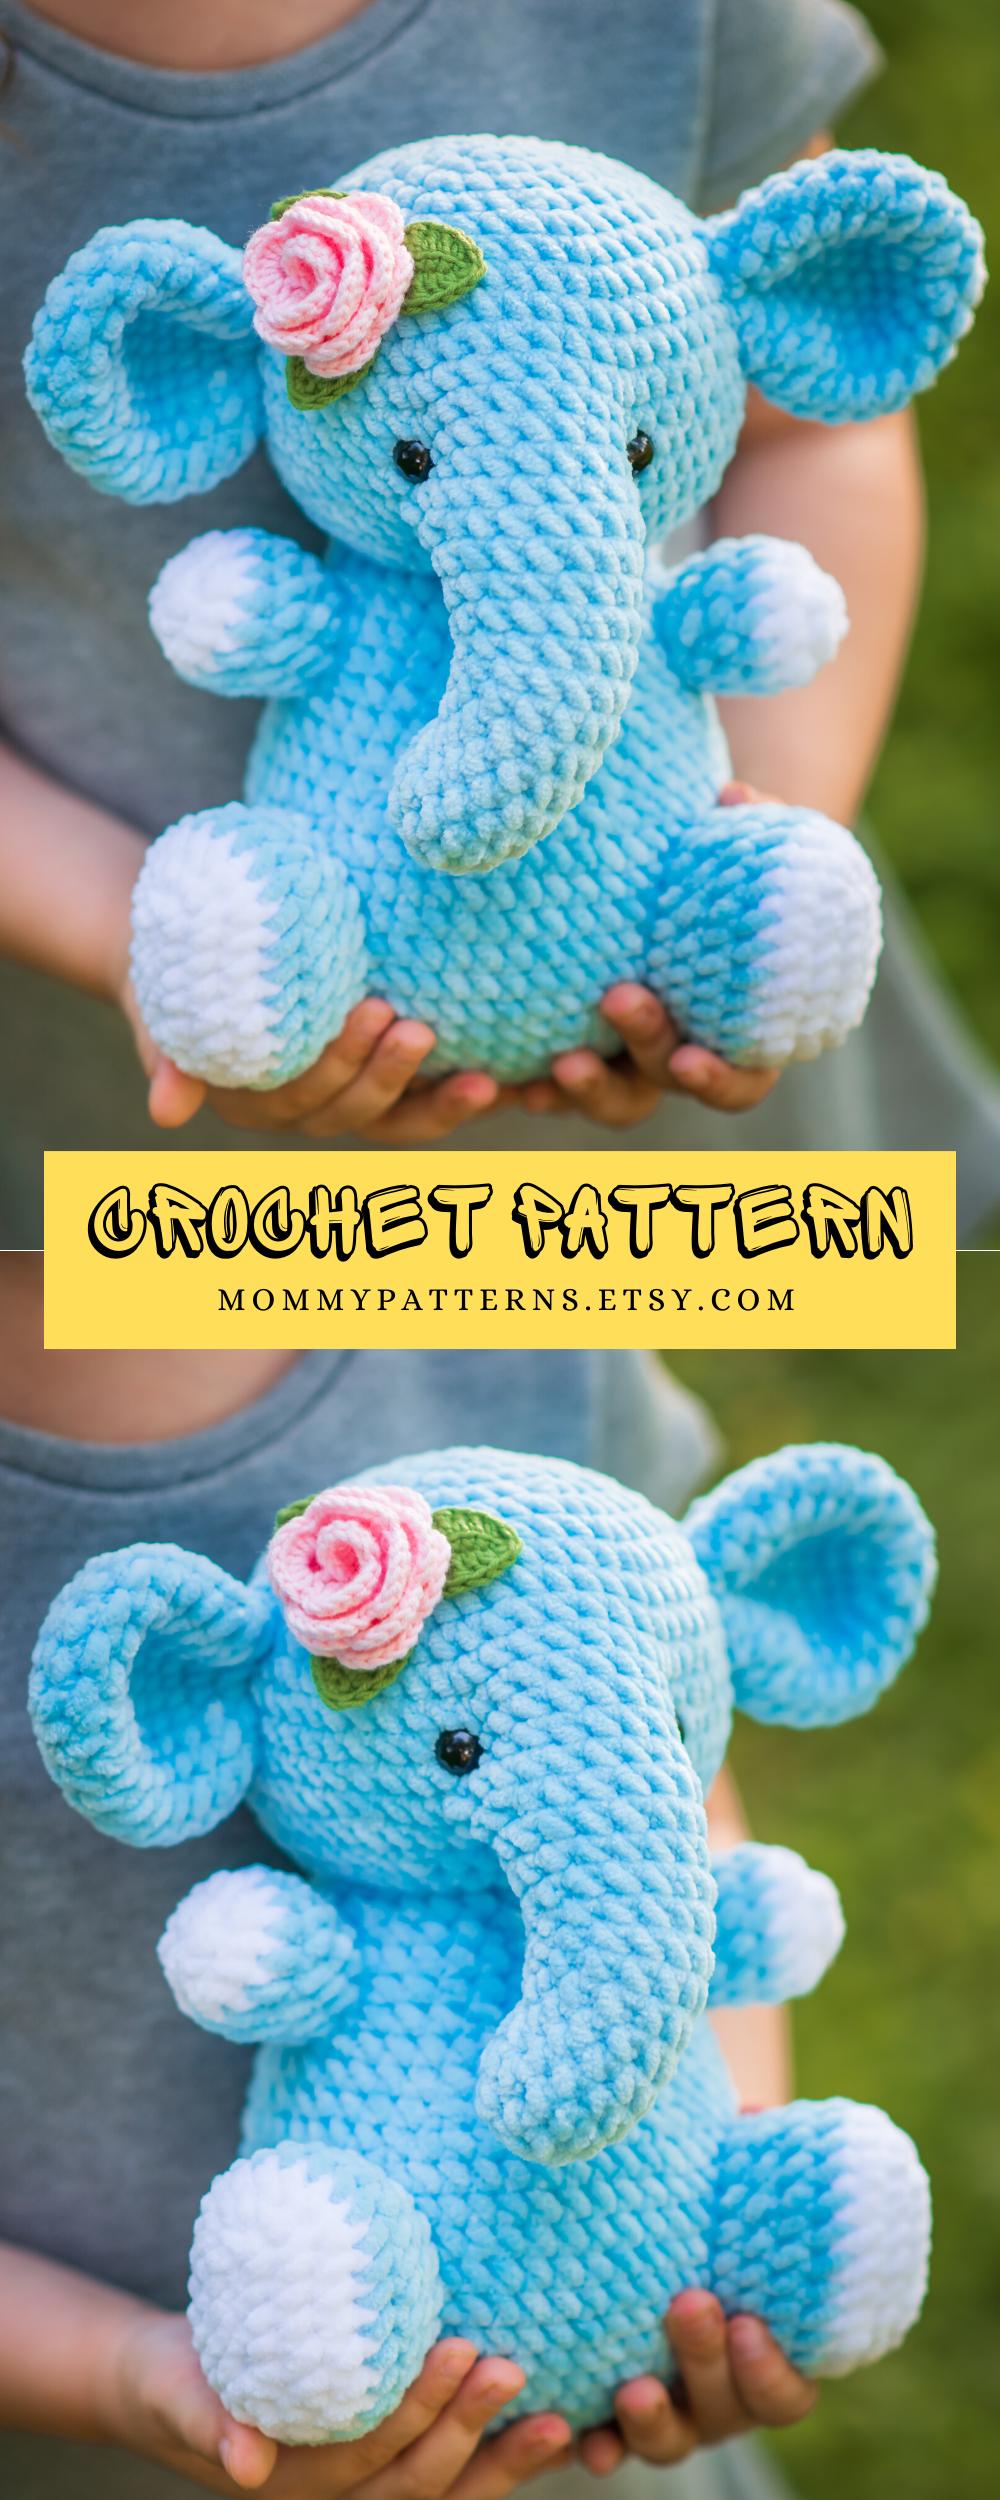 CROCHET PATTERN toy Elephant